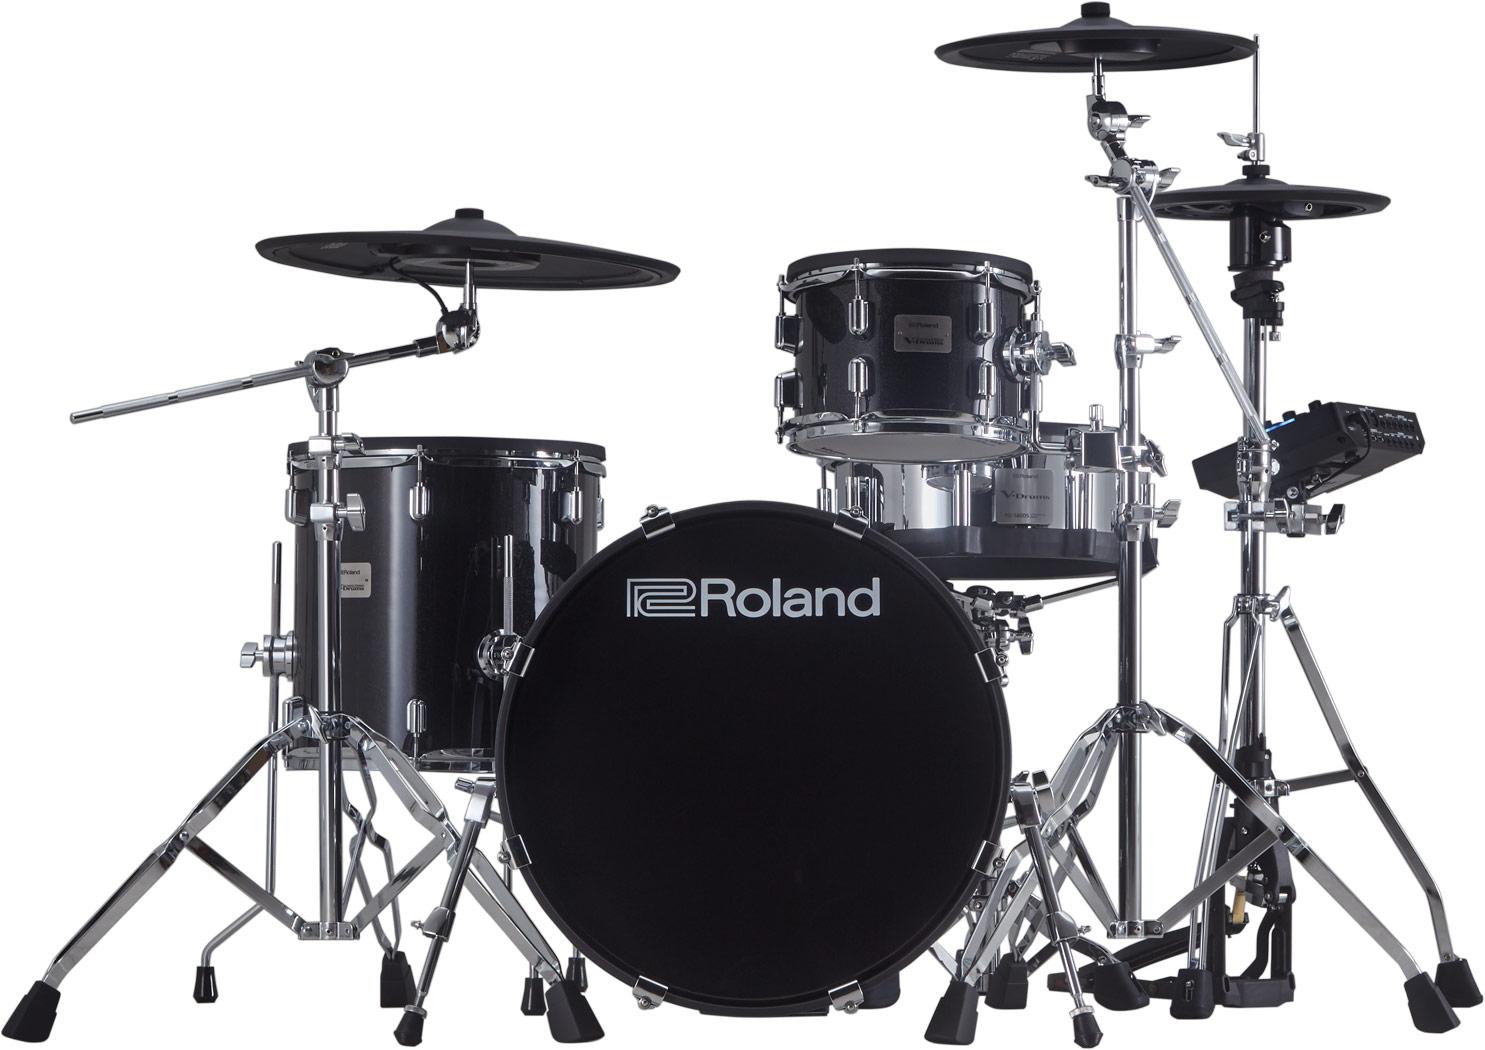 ROLAND-VAD-503-KIT-NO-CODE-sku-45362377